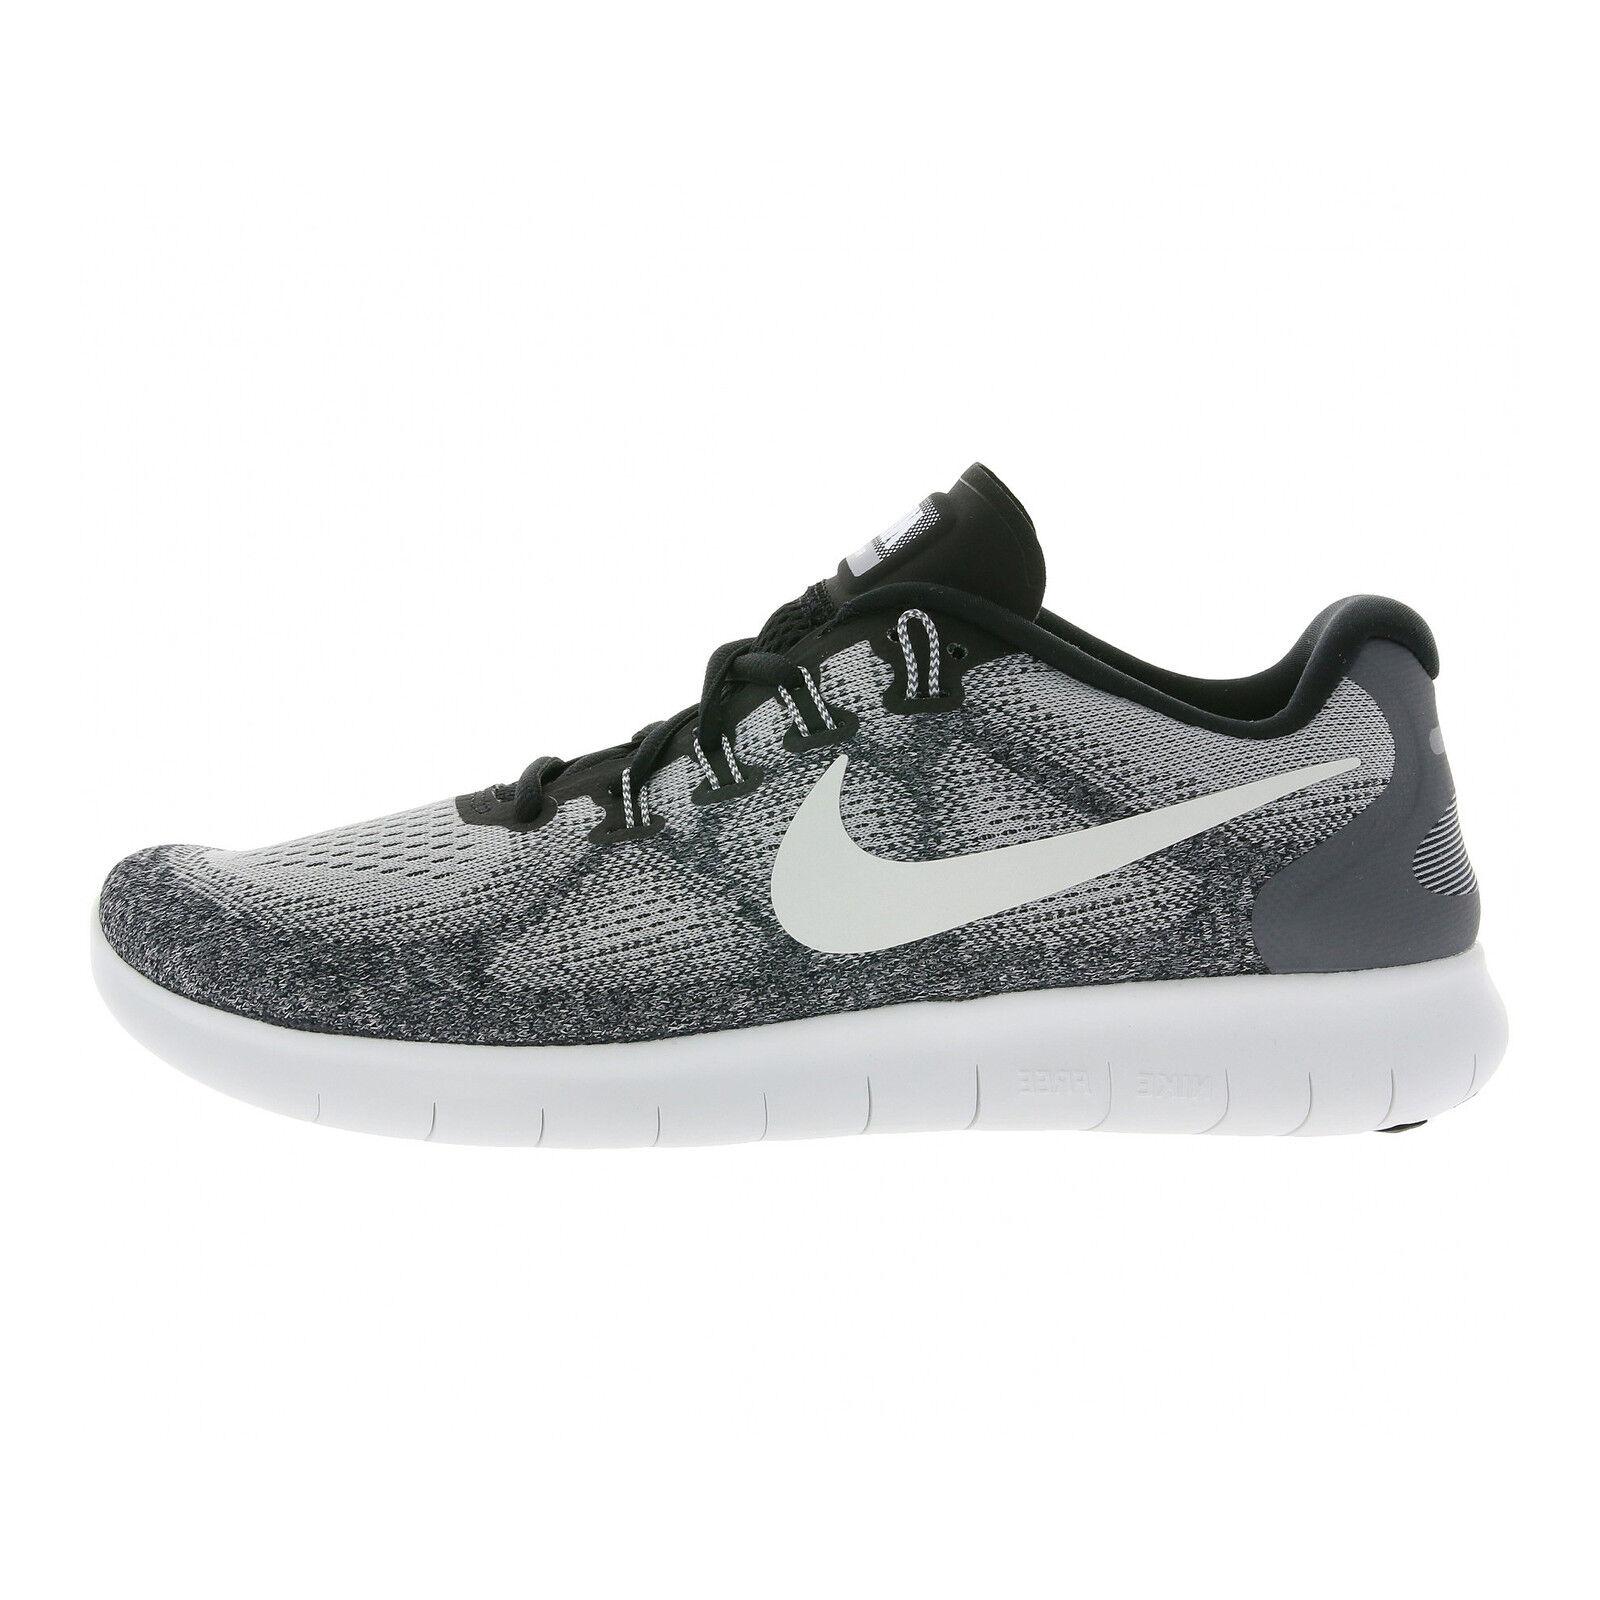 Nike Free RN RN Free 2018 Deportes 880839 002 Zapatillas de running Deportes 3a0cc9